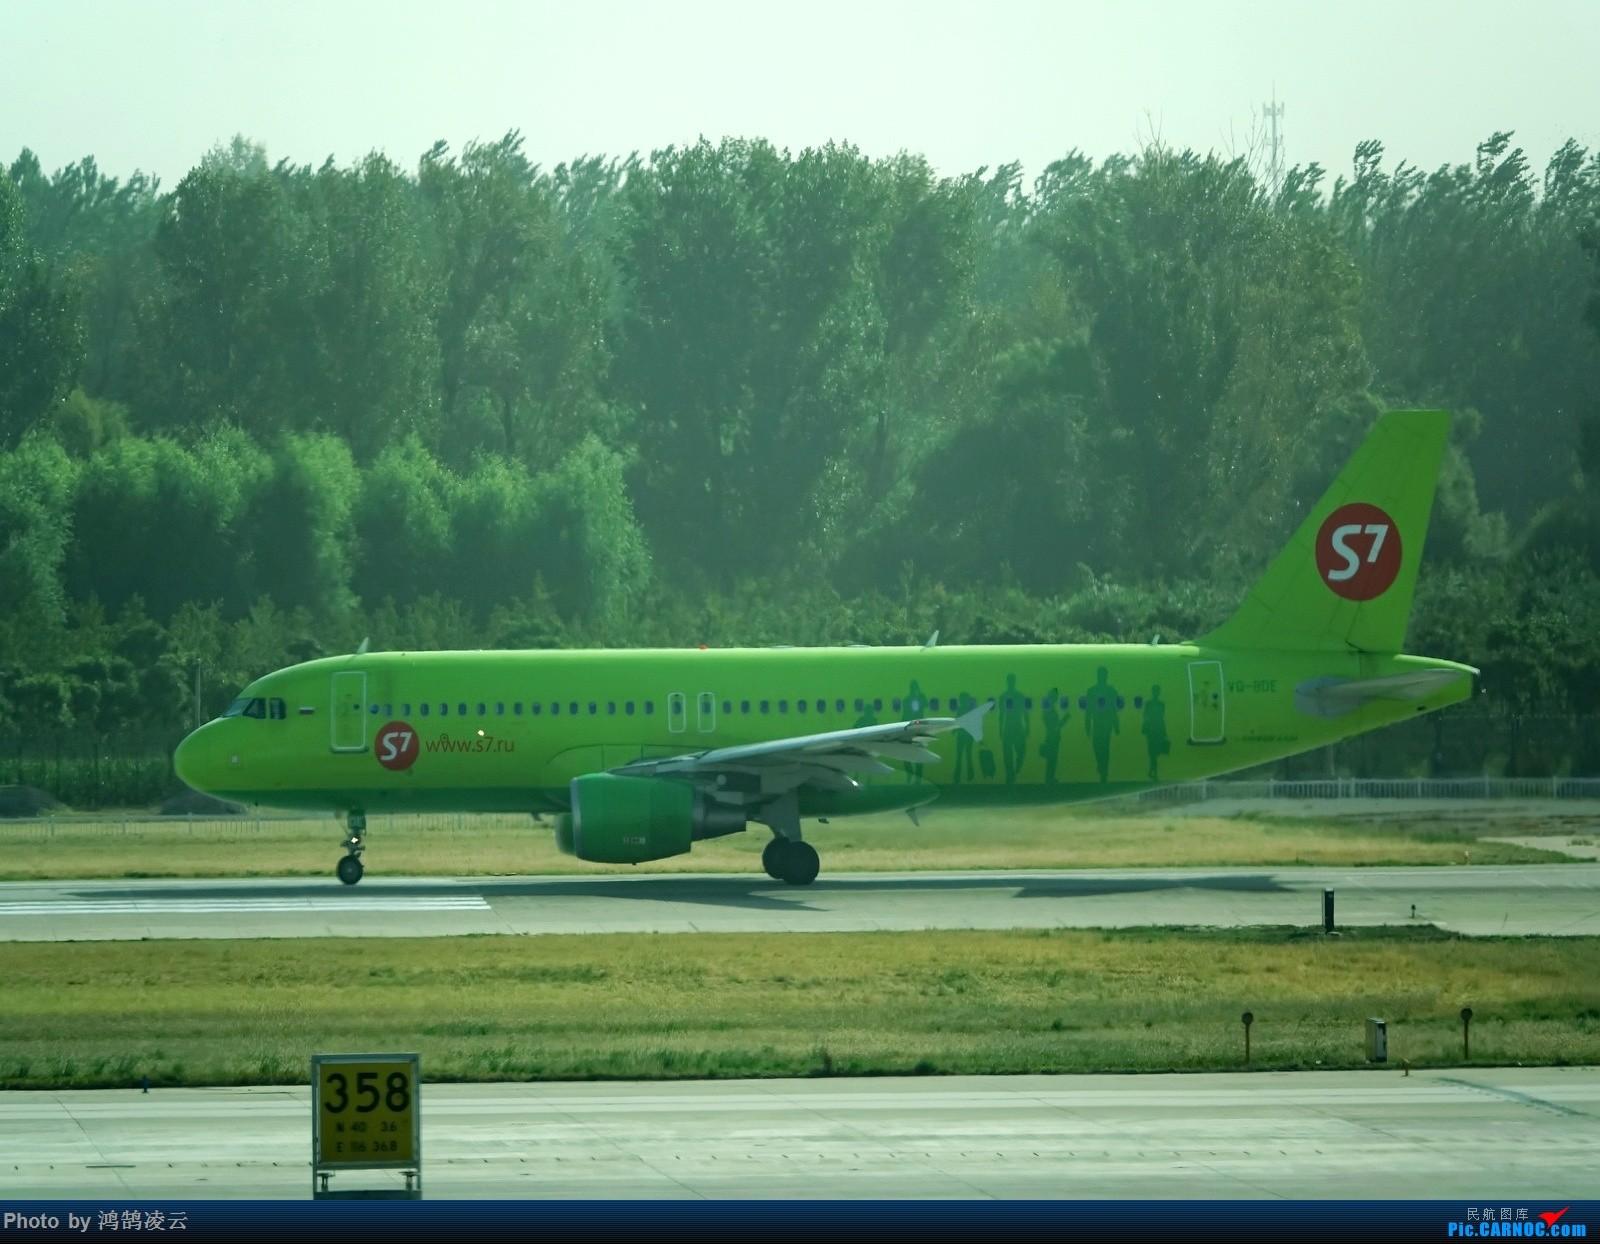 Re:在PEK起飞的西伯利亚航空(S7)新装Embraer E-170.